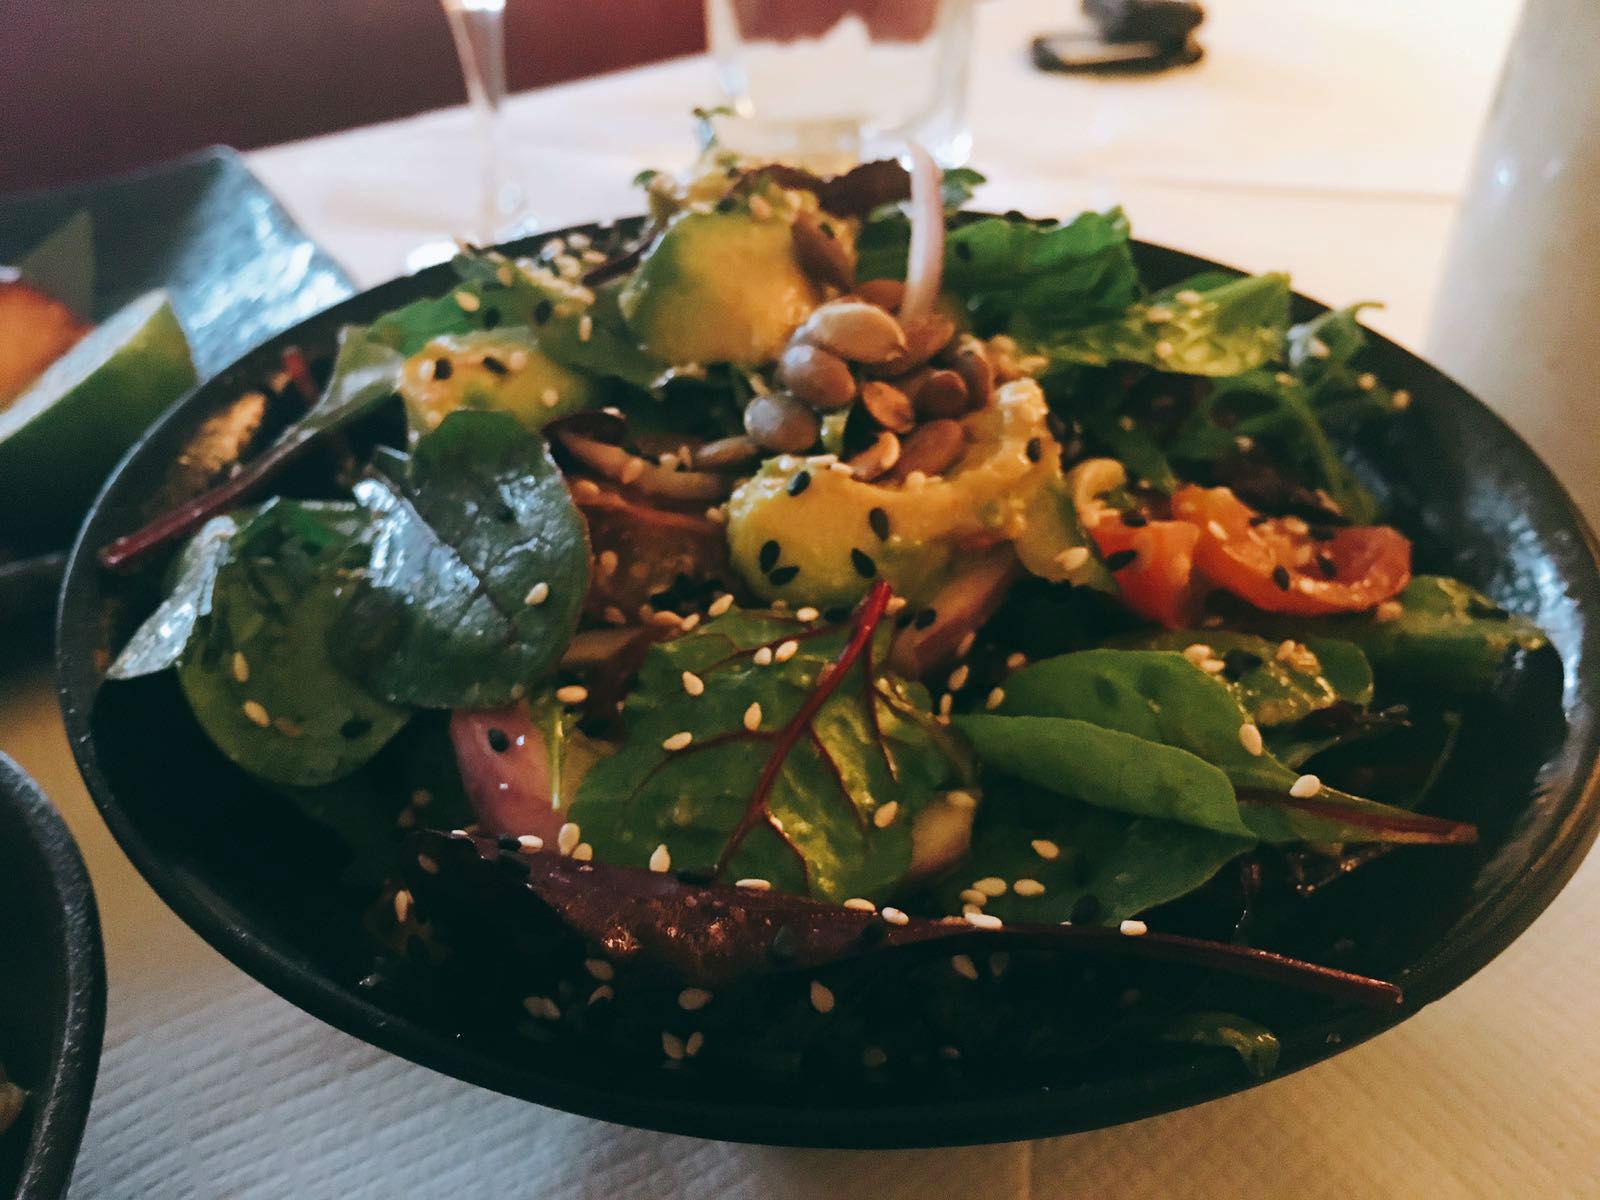 eight-over-eight-review_avocado salad.jpg